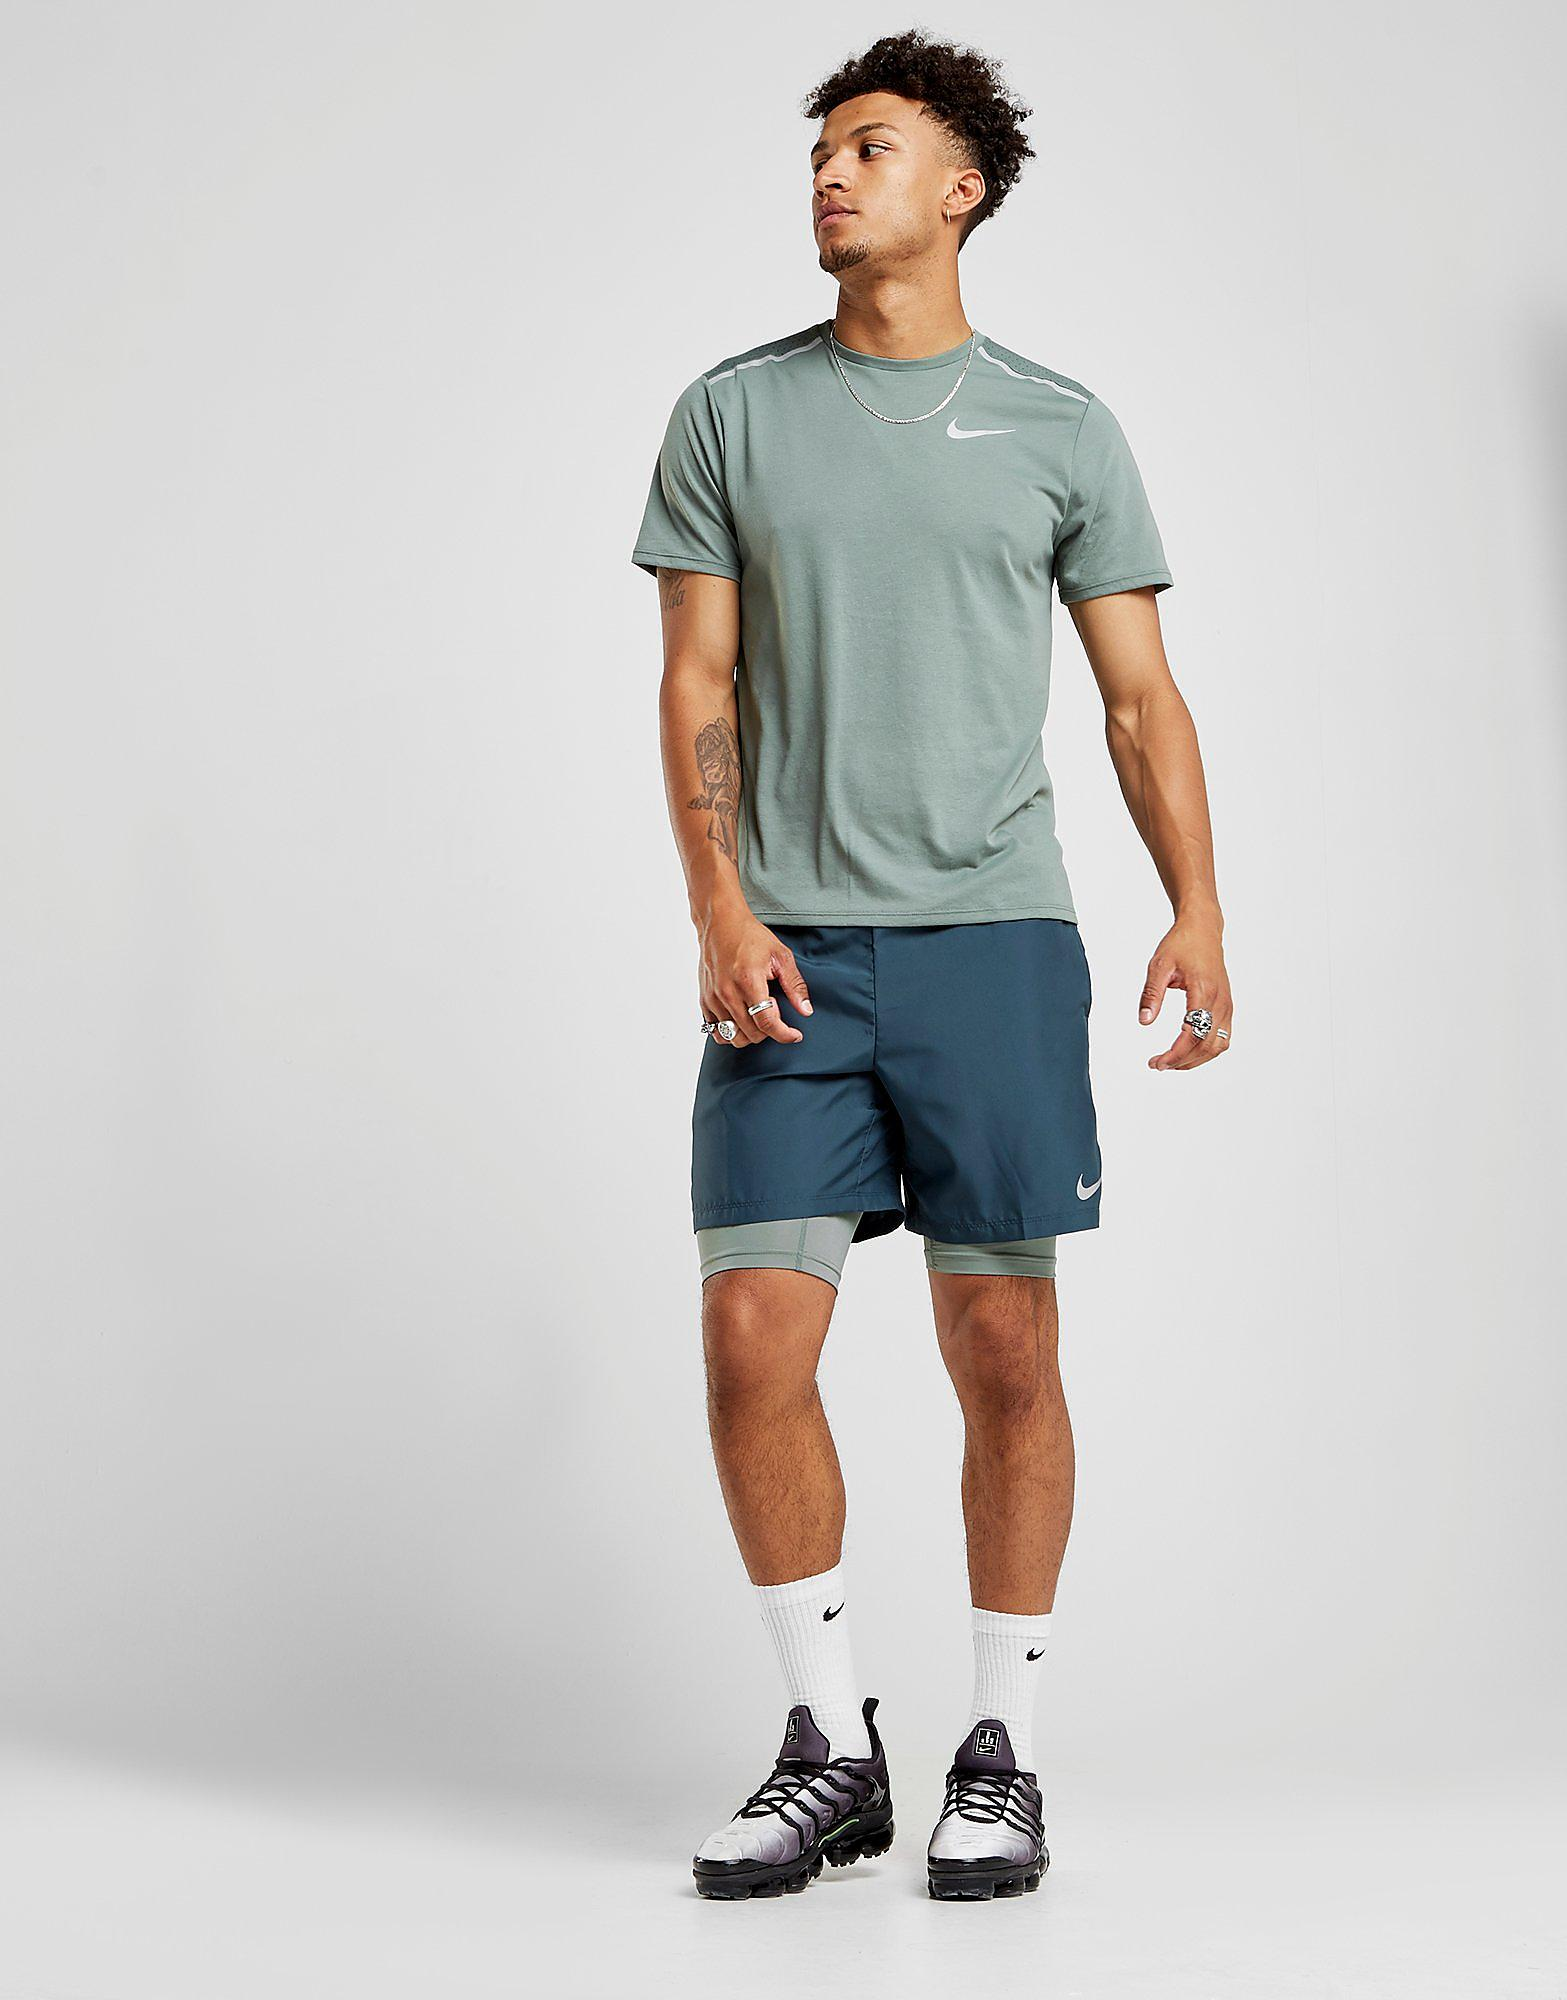 Nike Breath Tailwind Short Sleeve T-Shirt